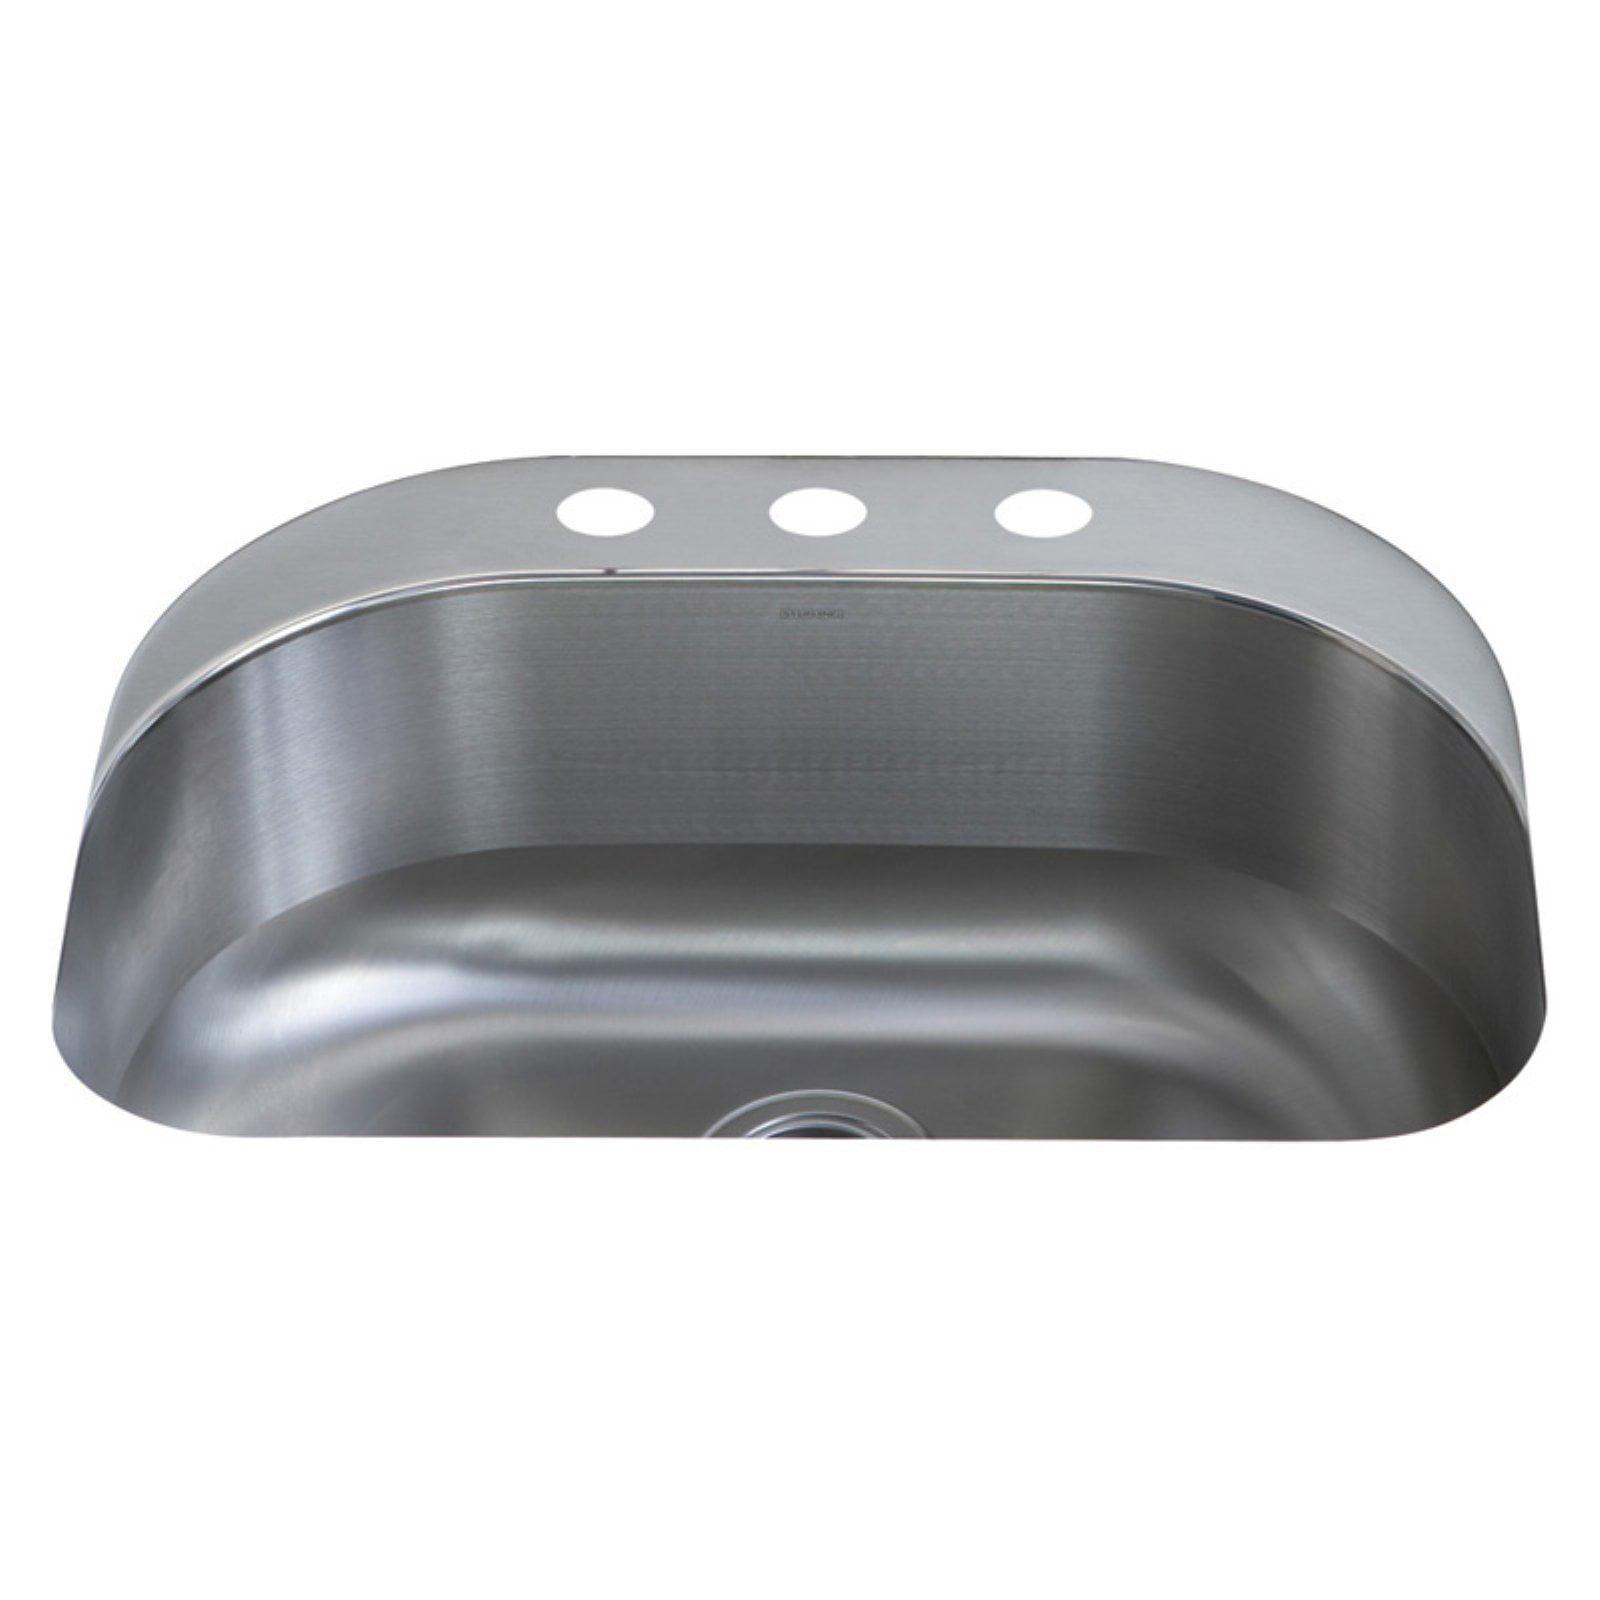 Sterling by Kohler Cin.® 11722-3 Single Basin Undermount Kitchen Sink